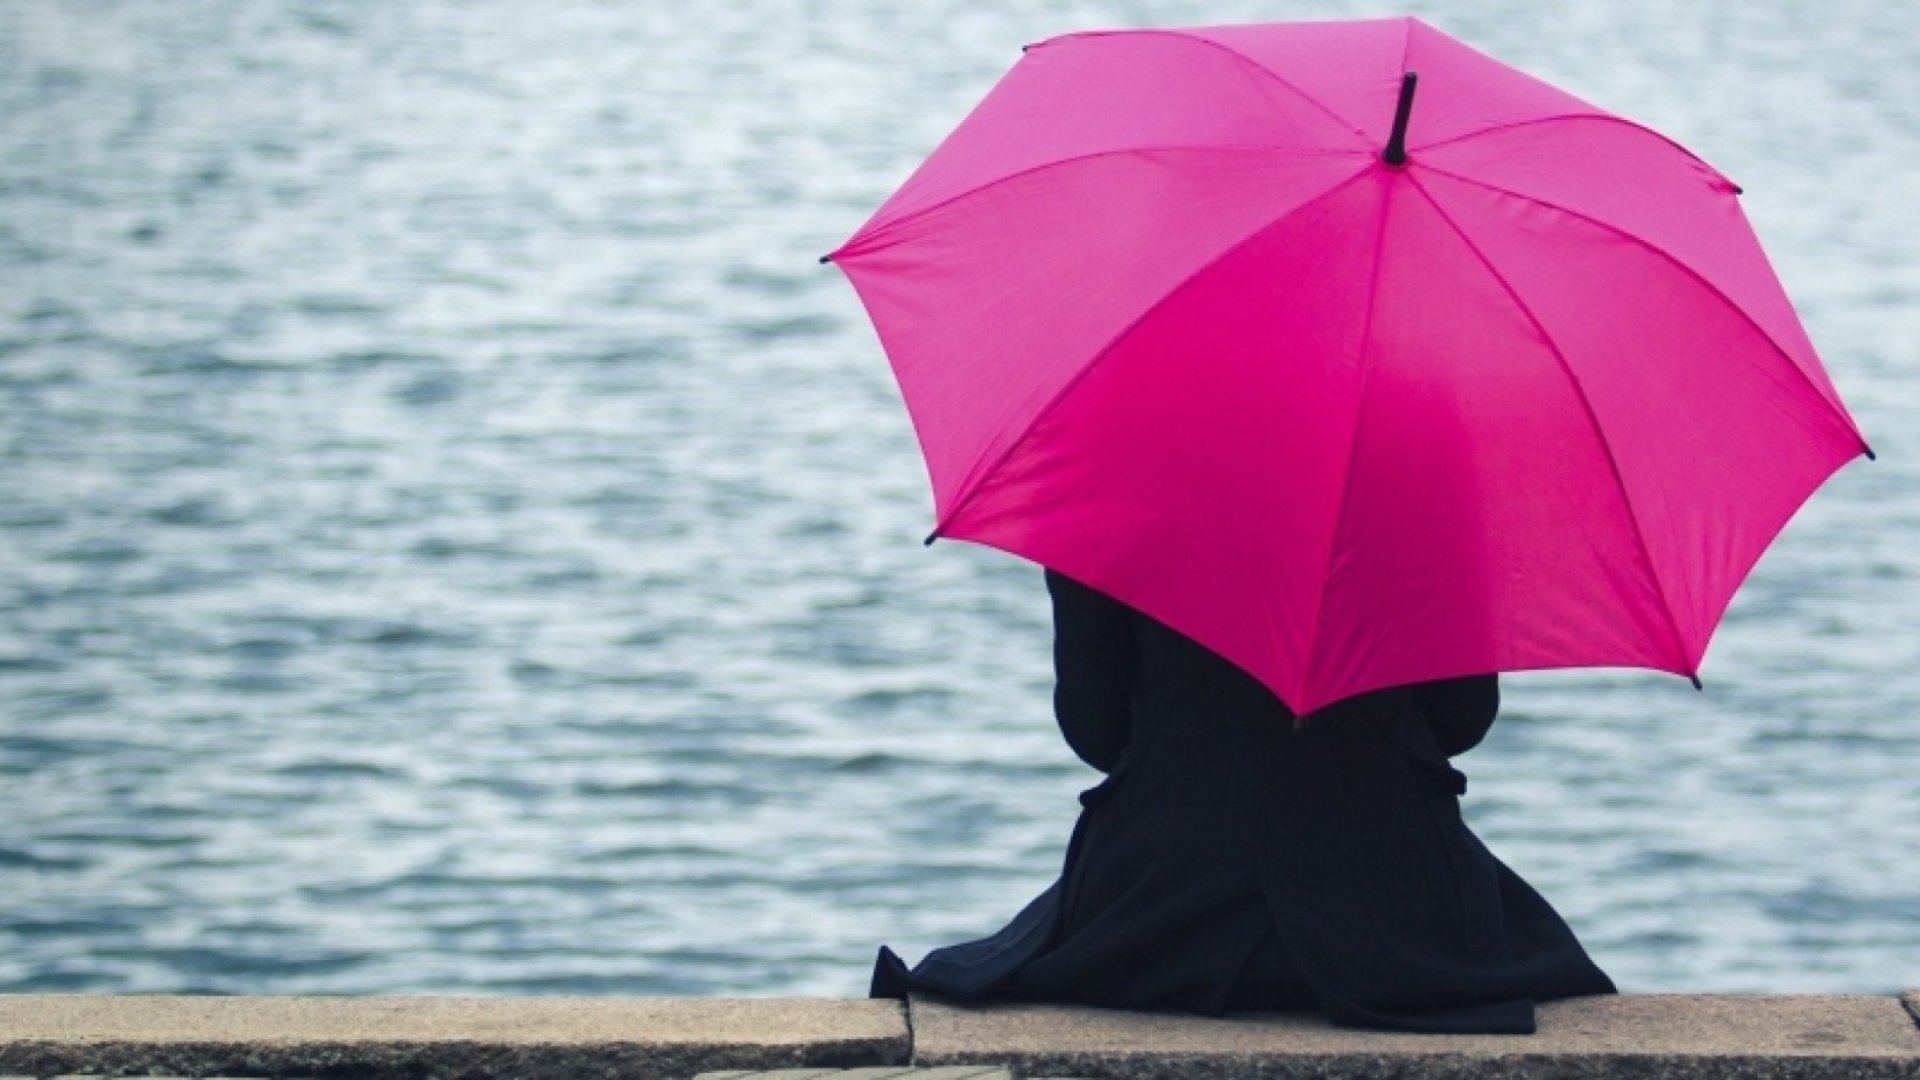 5 Reasons Being a Solopreneur Is Great